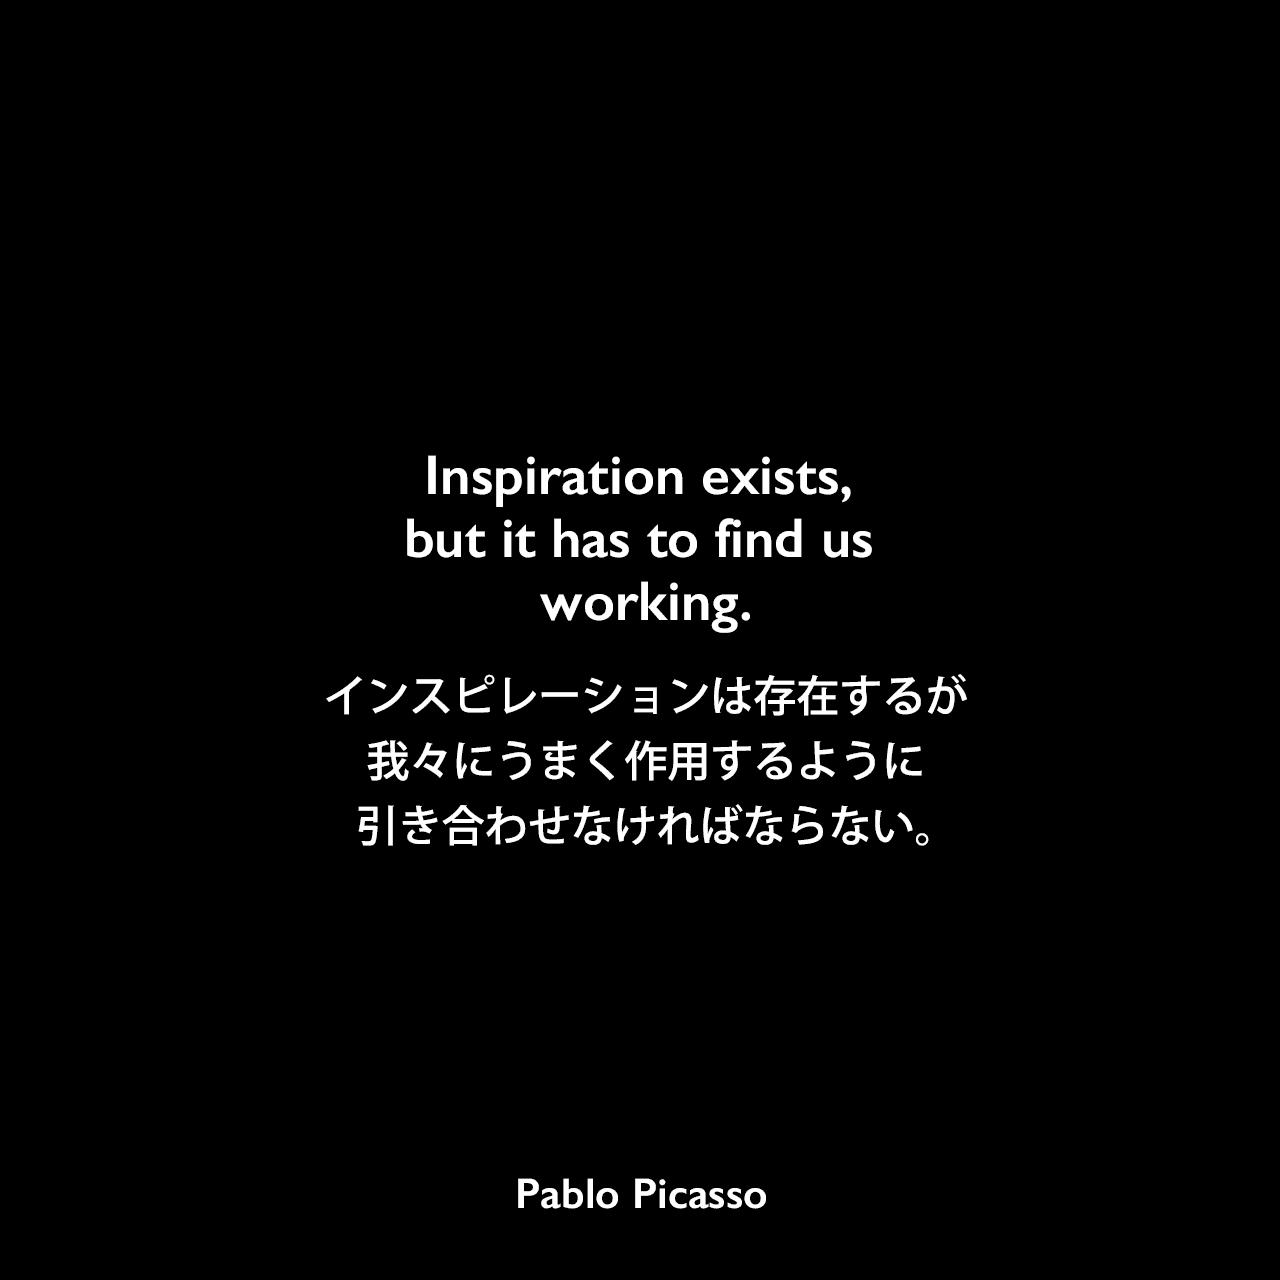 Inspiration exists, but it has to find us working.インスピレーションは存在するが、我々にうまく作用するように引き合わせなければならない。Pablo Picasso